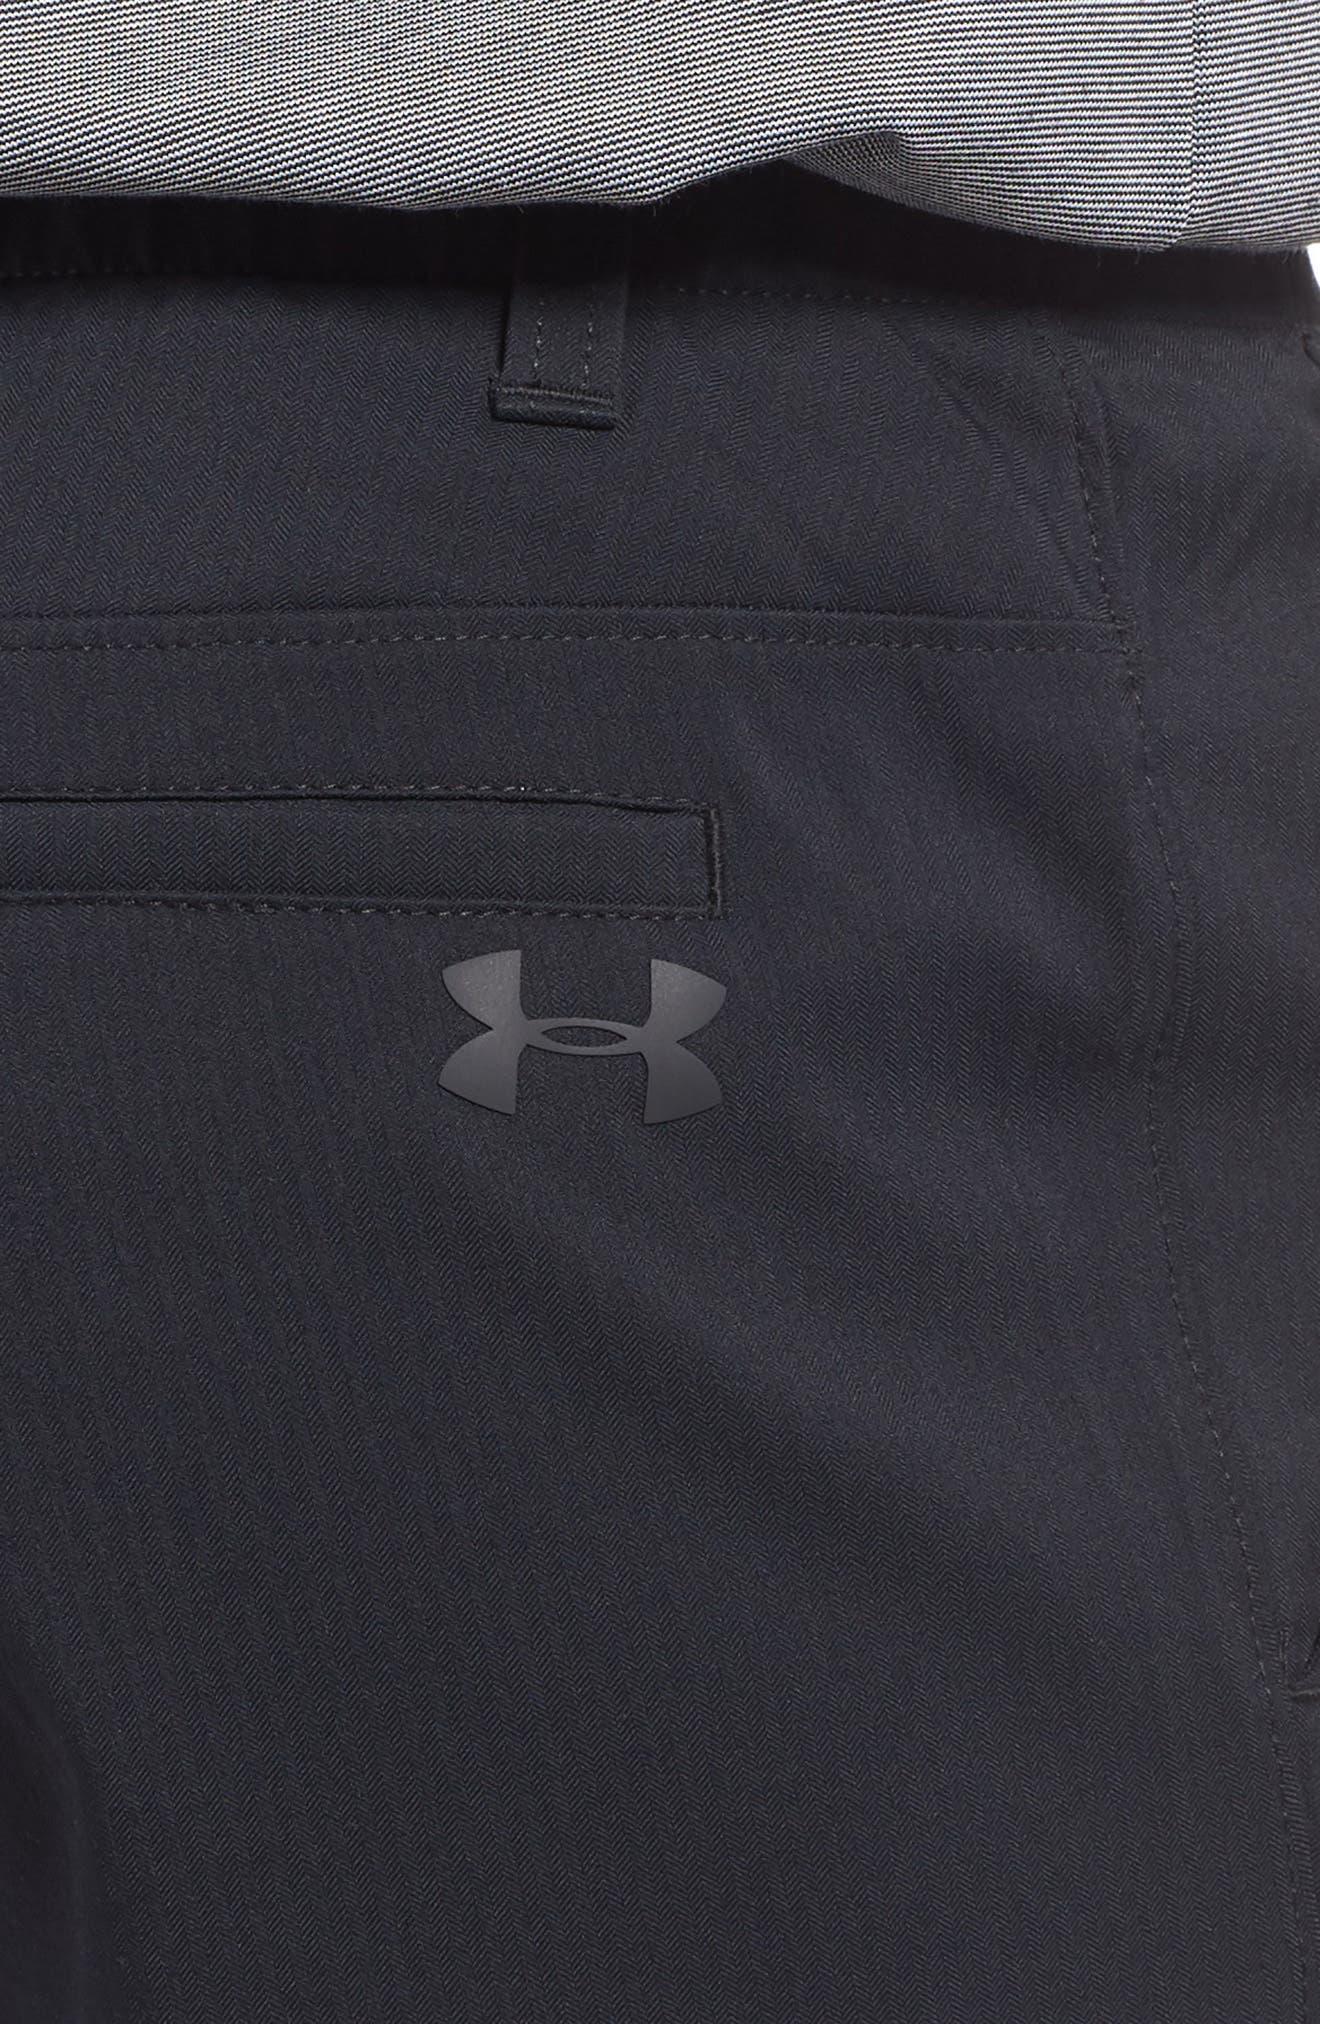 Takeover Regular Fit Golf Shorts,                             Alternate thumbnail 4, color,                             BLACK